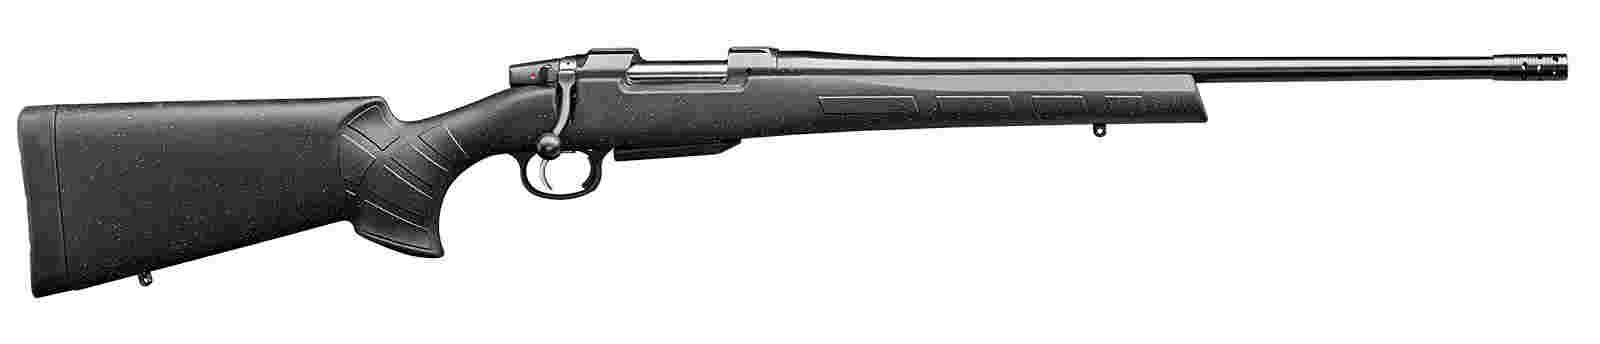 cz rifle 557